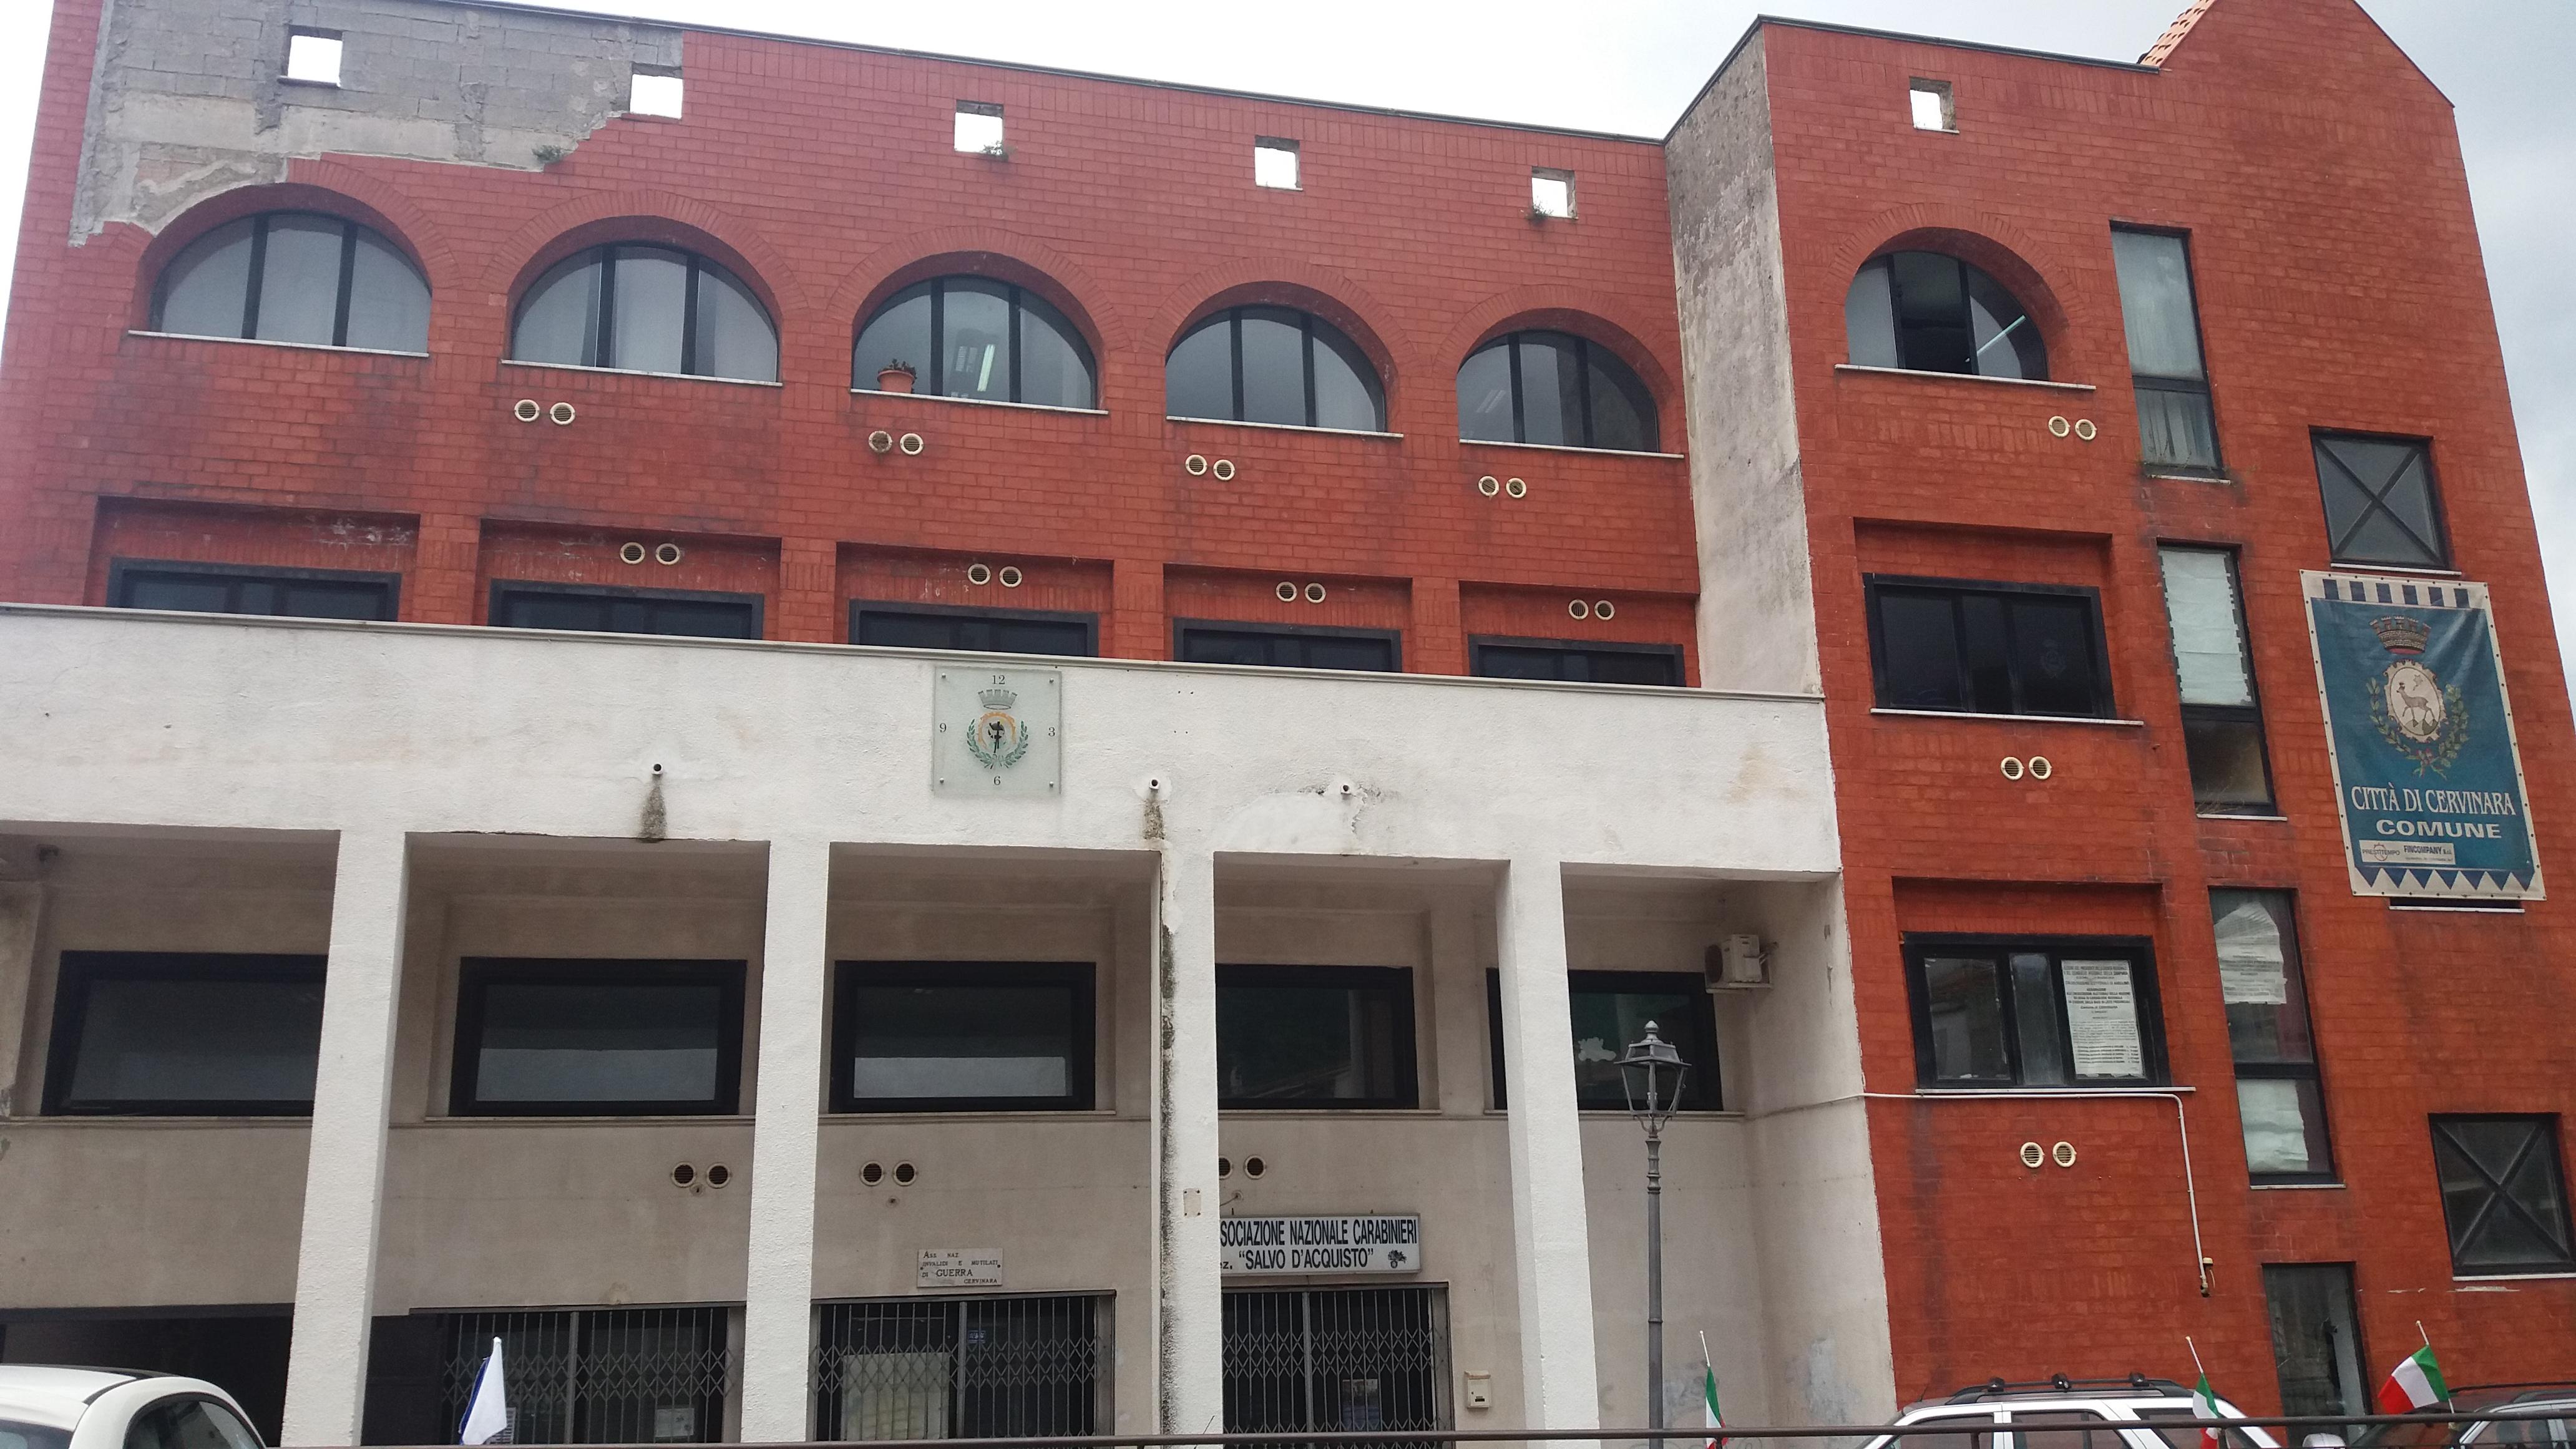 Cervinara| L'assessore regionale Marciani a tutela delle donne